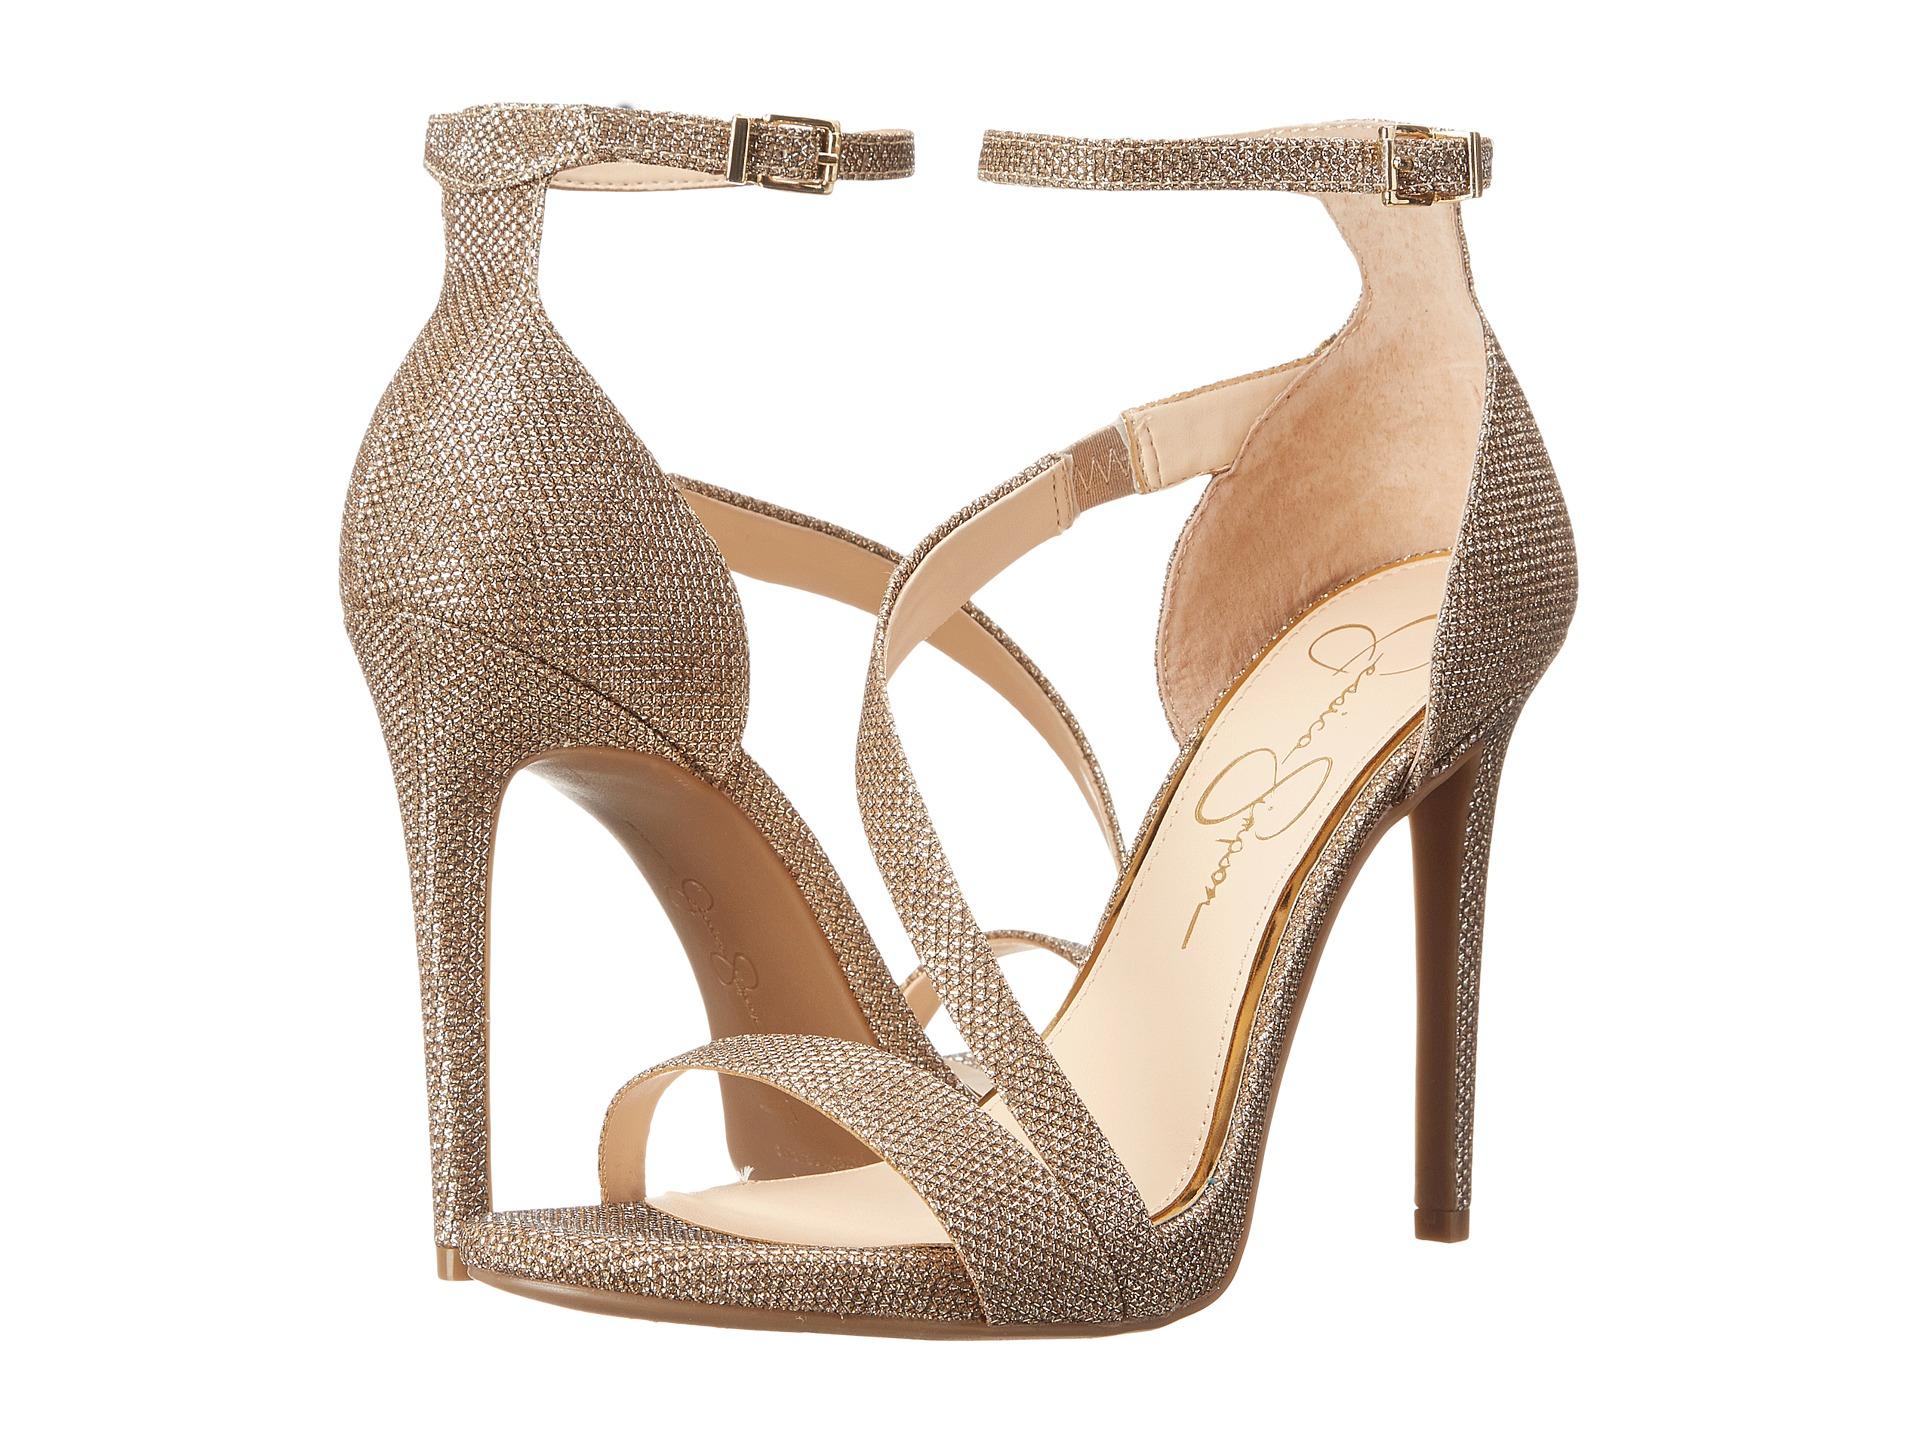 Lyst Jessica Simpson Rayli Beaded Ankle Strap Dress